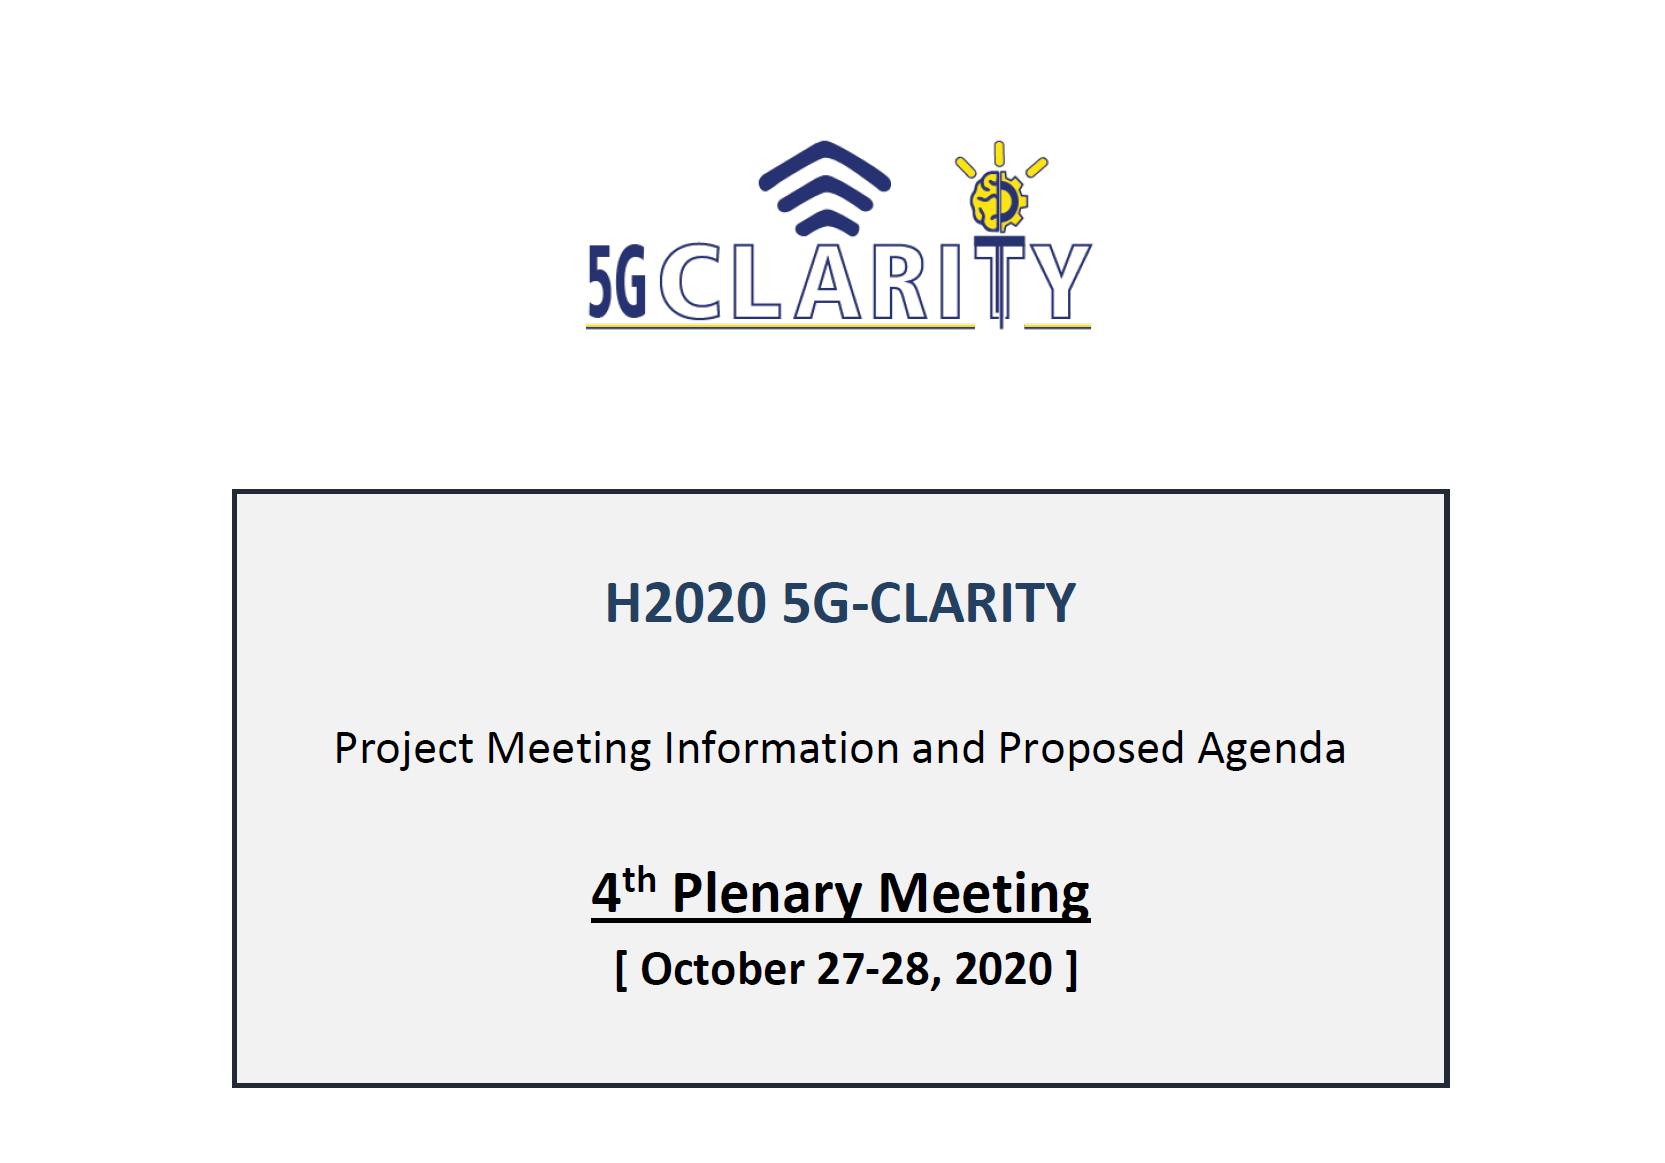 5G-CLARITY 4th Plenary Meeting